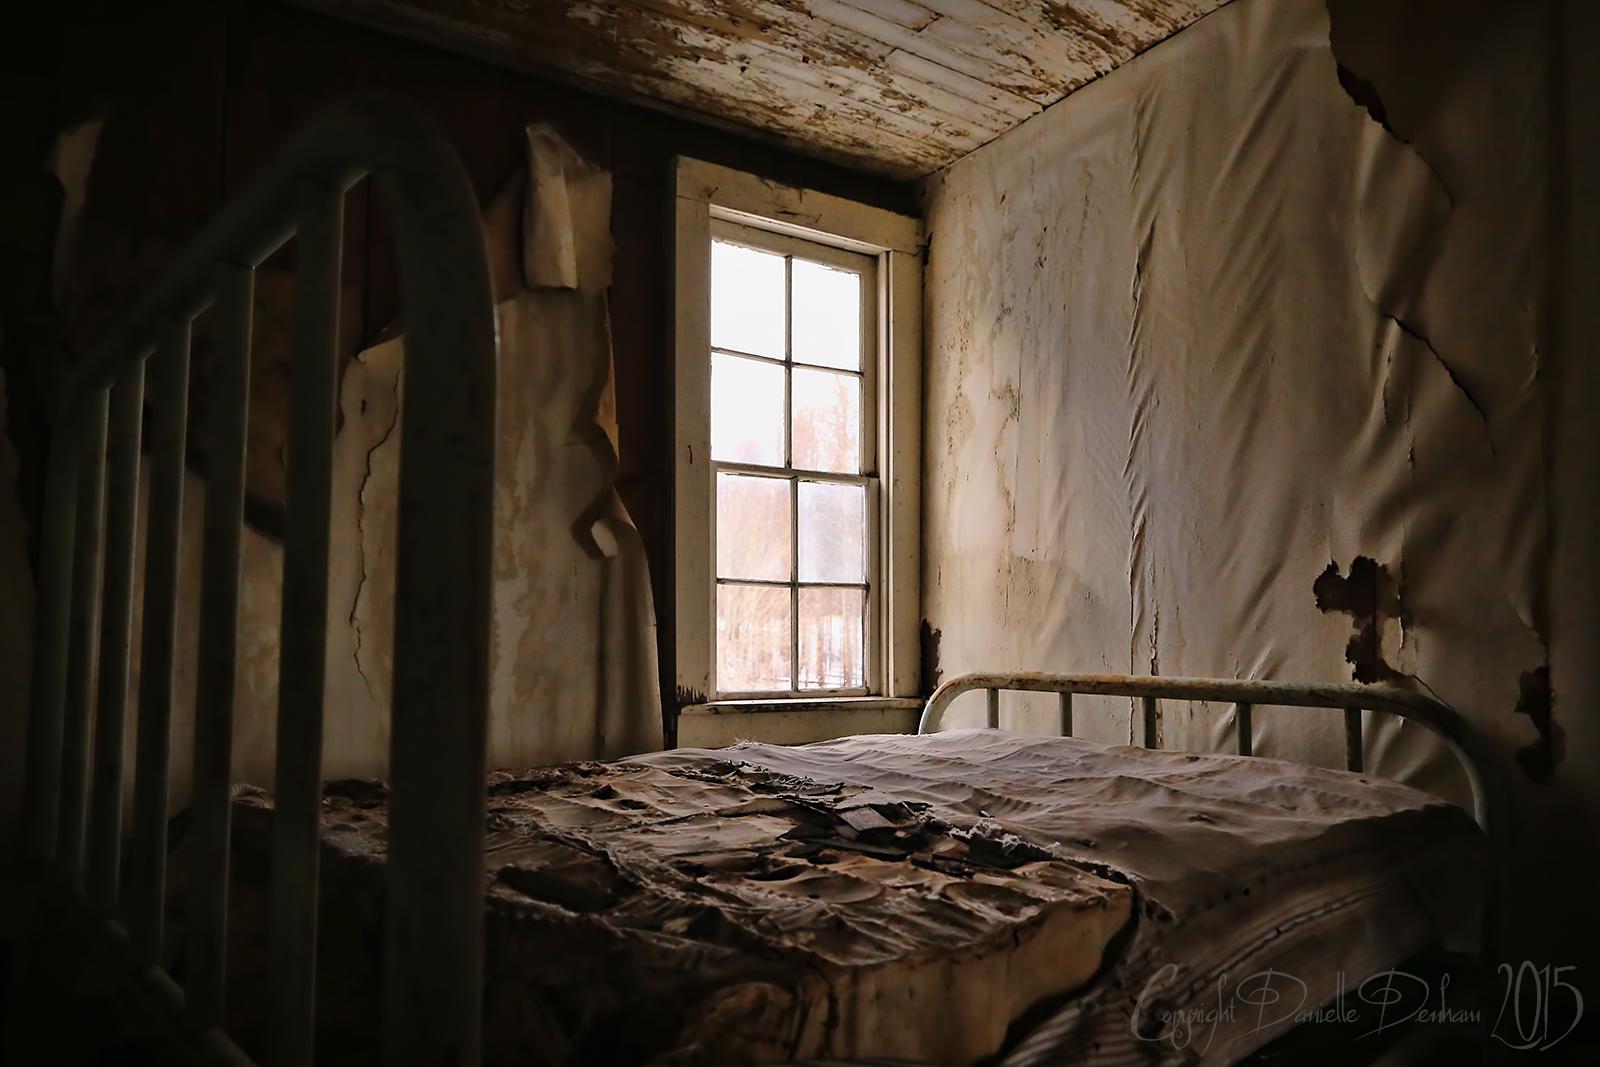 Fondos de pantalla : luz de sol, ventana, habitación, abandonado ...